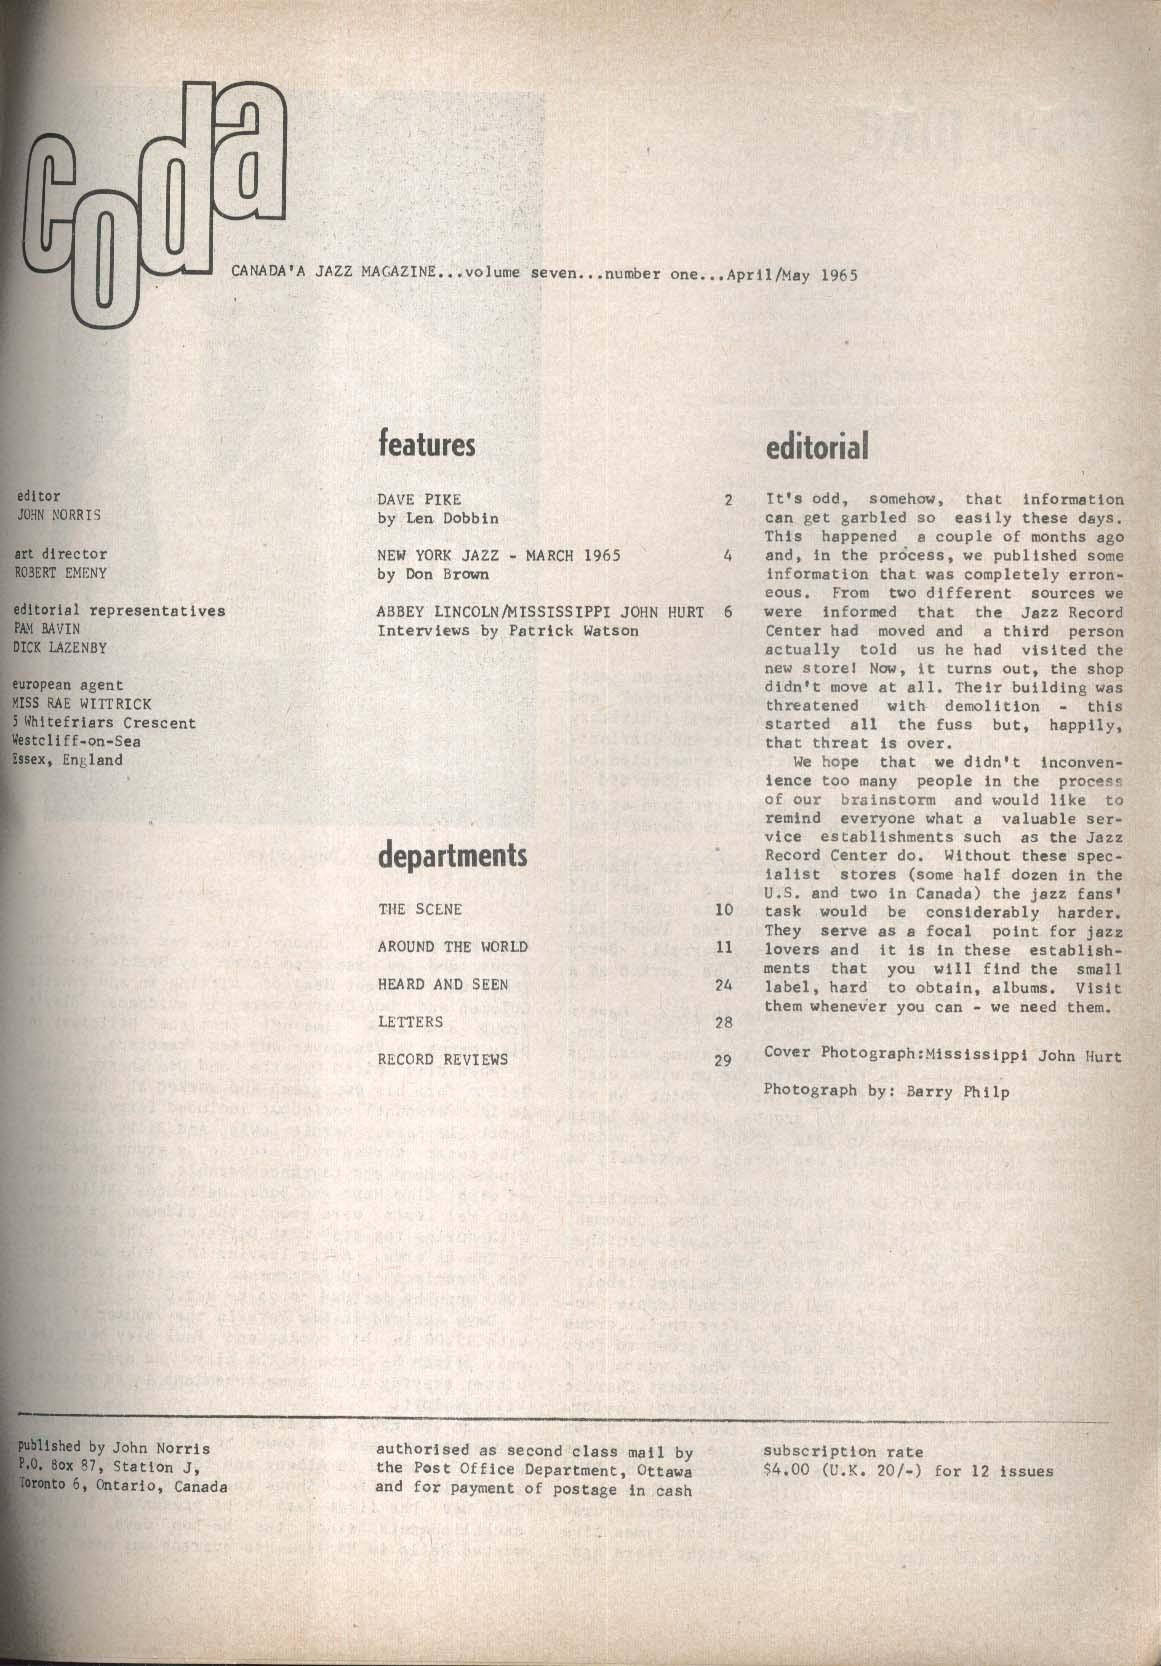 CODA Dave Pike Abbey Lincoln Mississippi John Hurt 4-5 1965